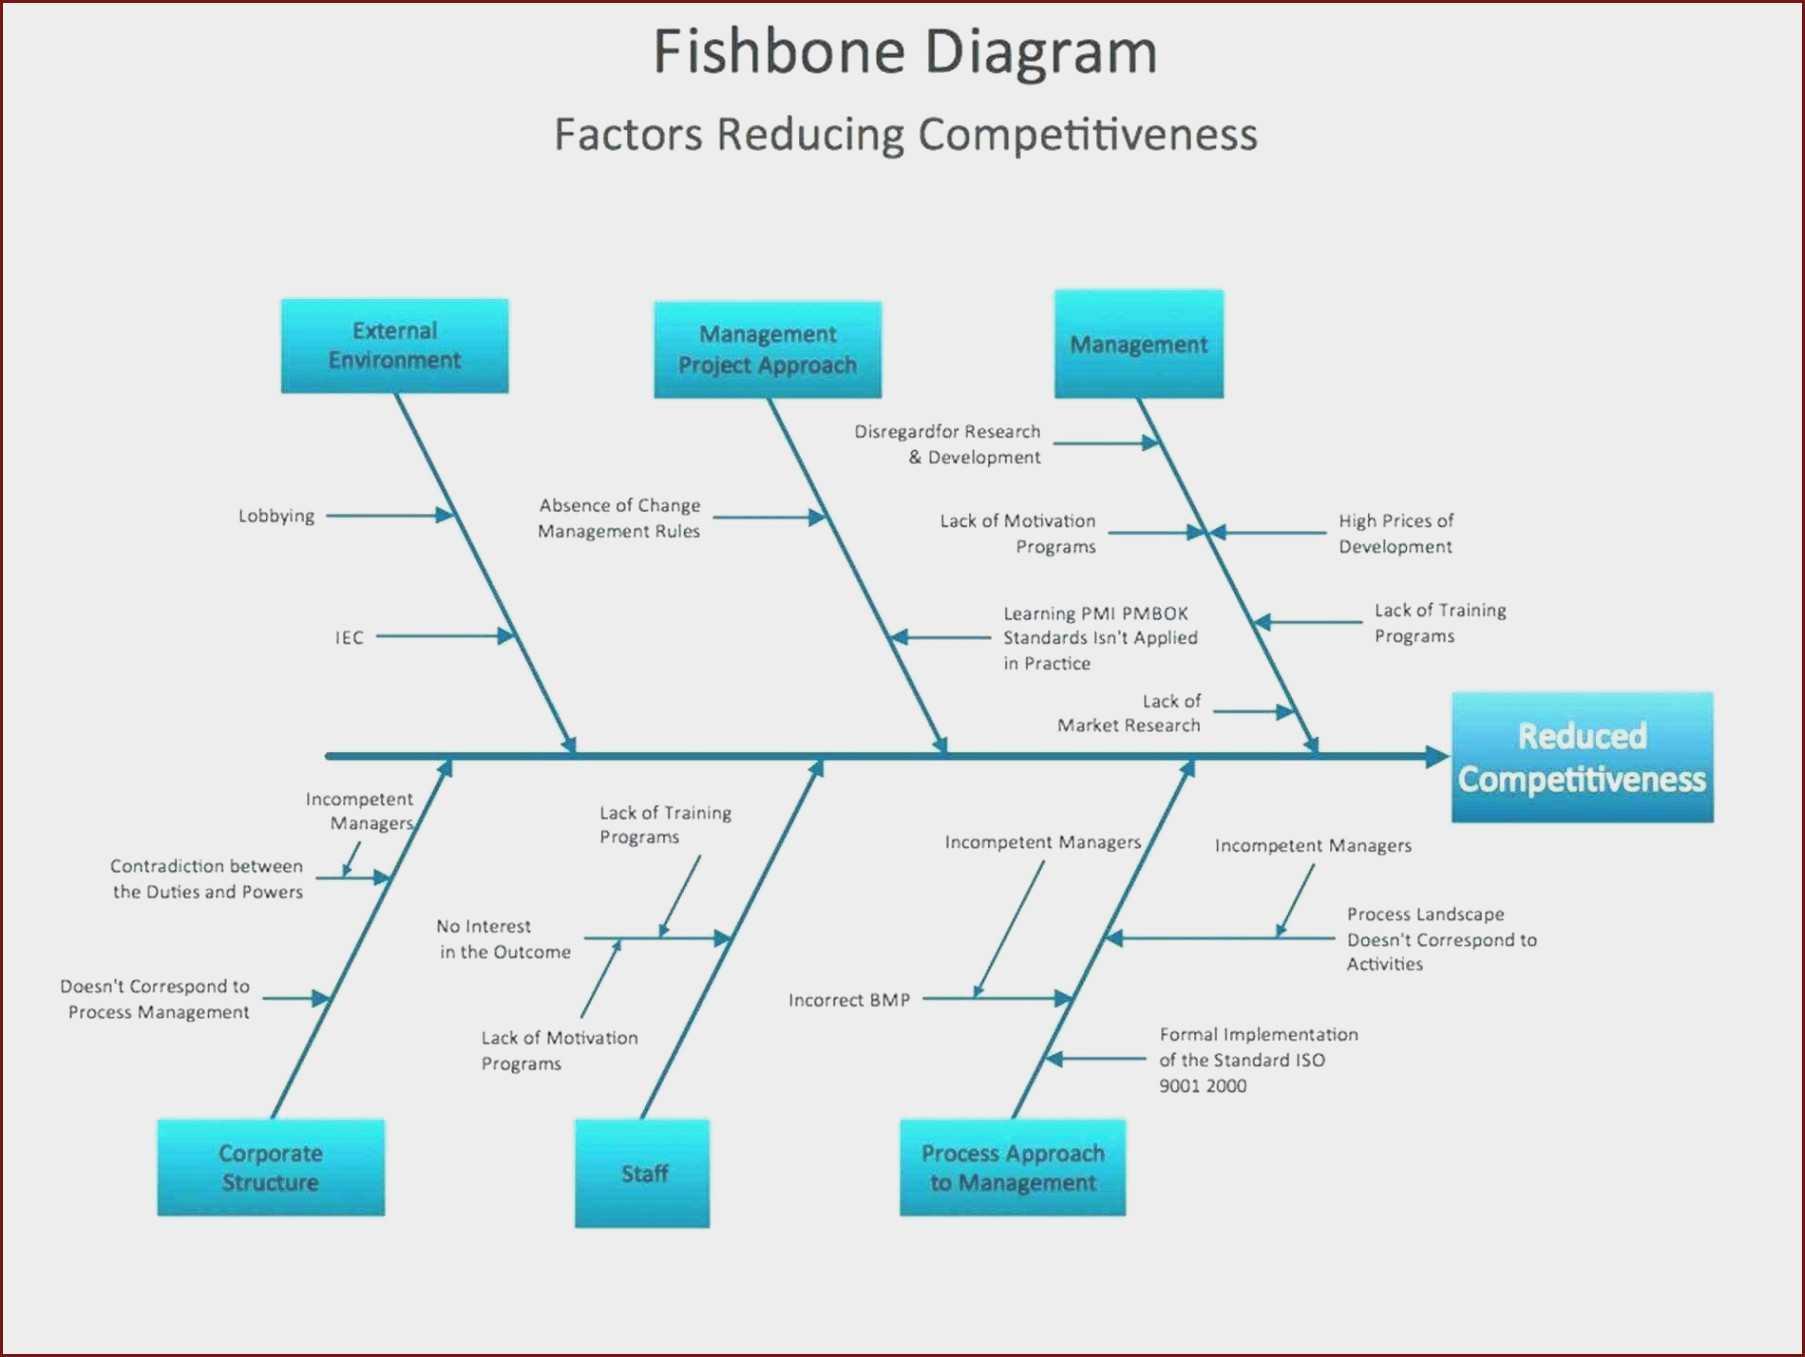 Fishbone Ishikawa Diagram Template At Manuals Library Intended For Ishikawa Diagram Template Word